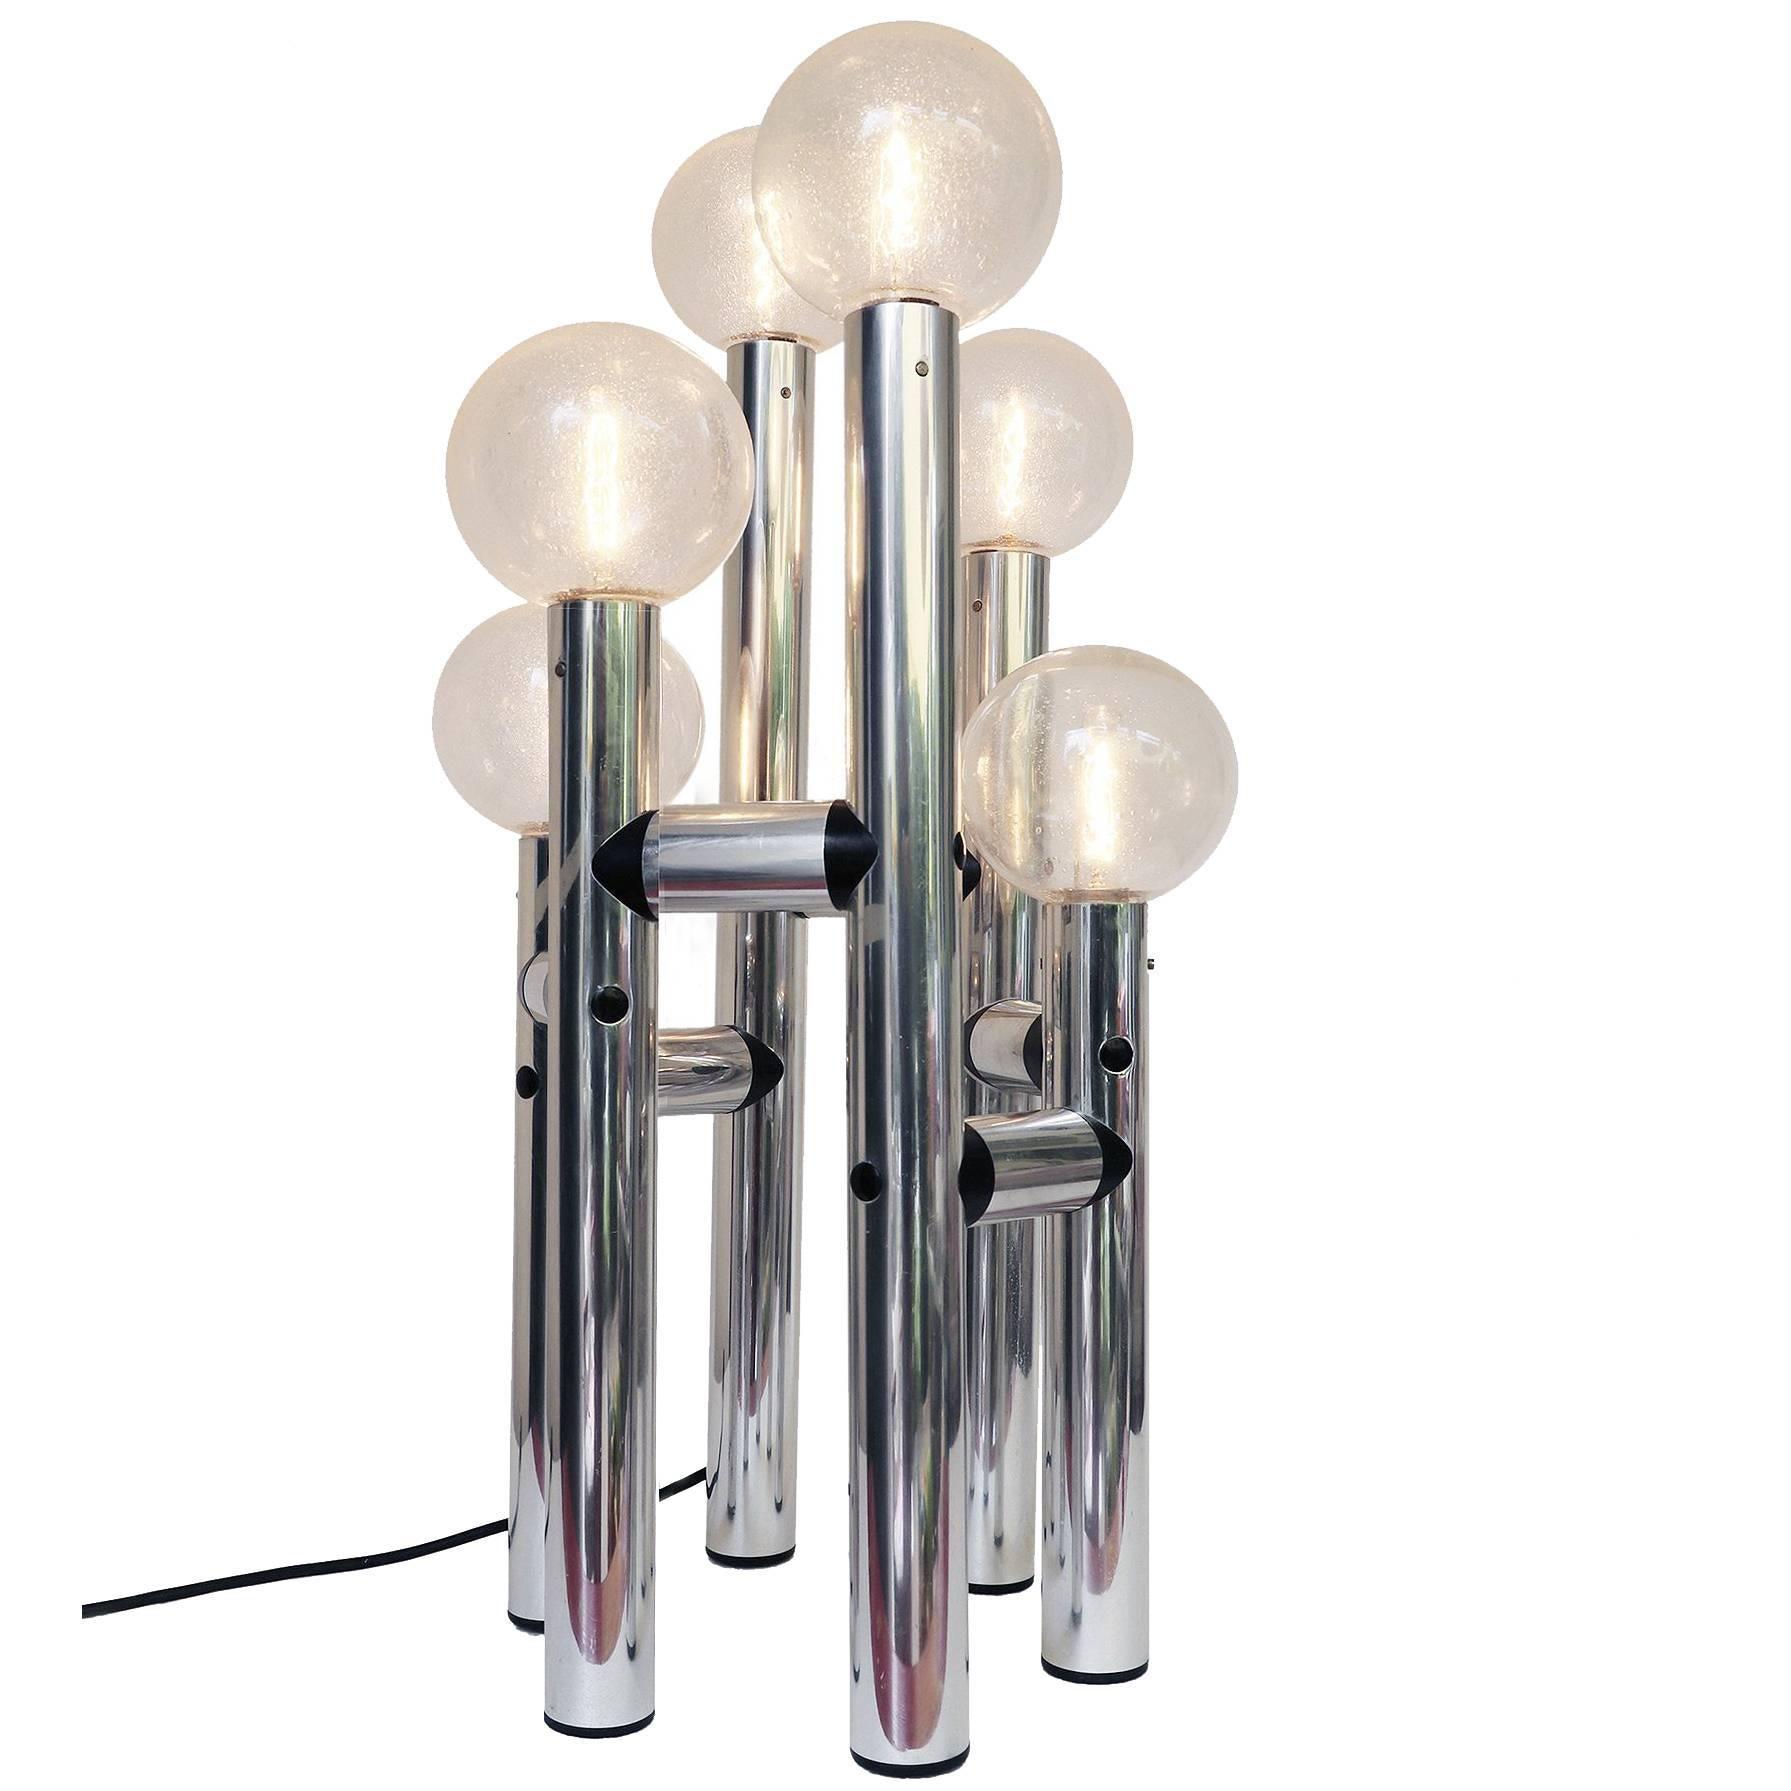 J.T. Kalmar Atomic Tower Floor Lamp RS6-TL Space Age 1972